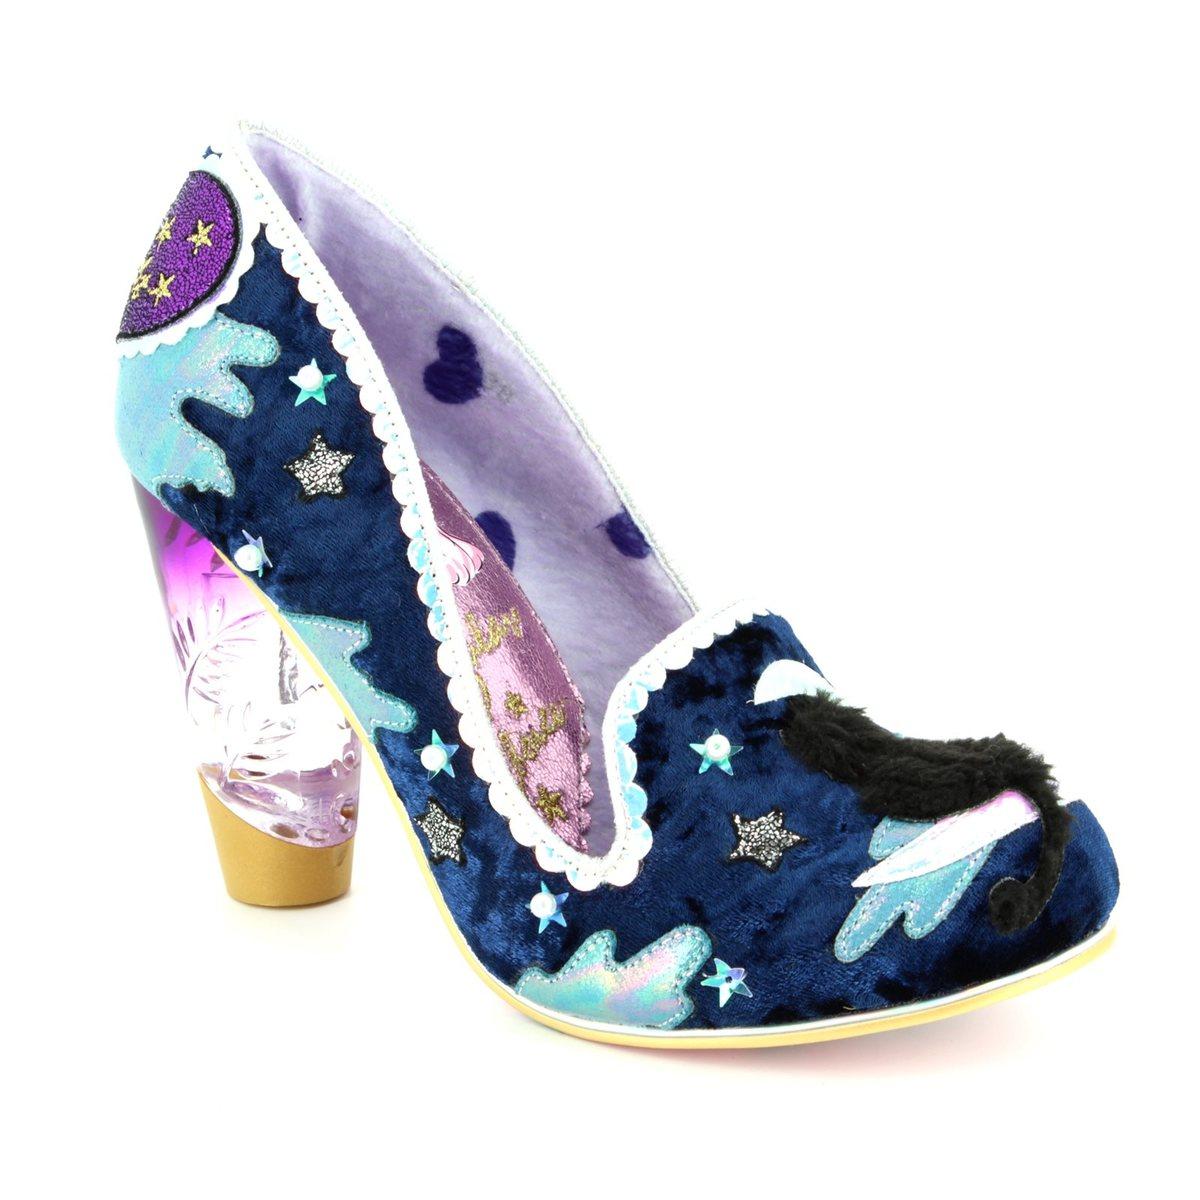 3964a3bc77b7 Irregular Choice High-heeled Shoes - Navy multi - 3801-69A STARS AT NIGHT